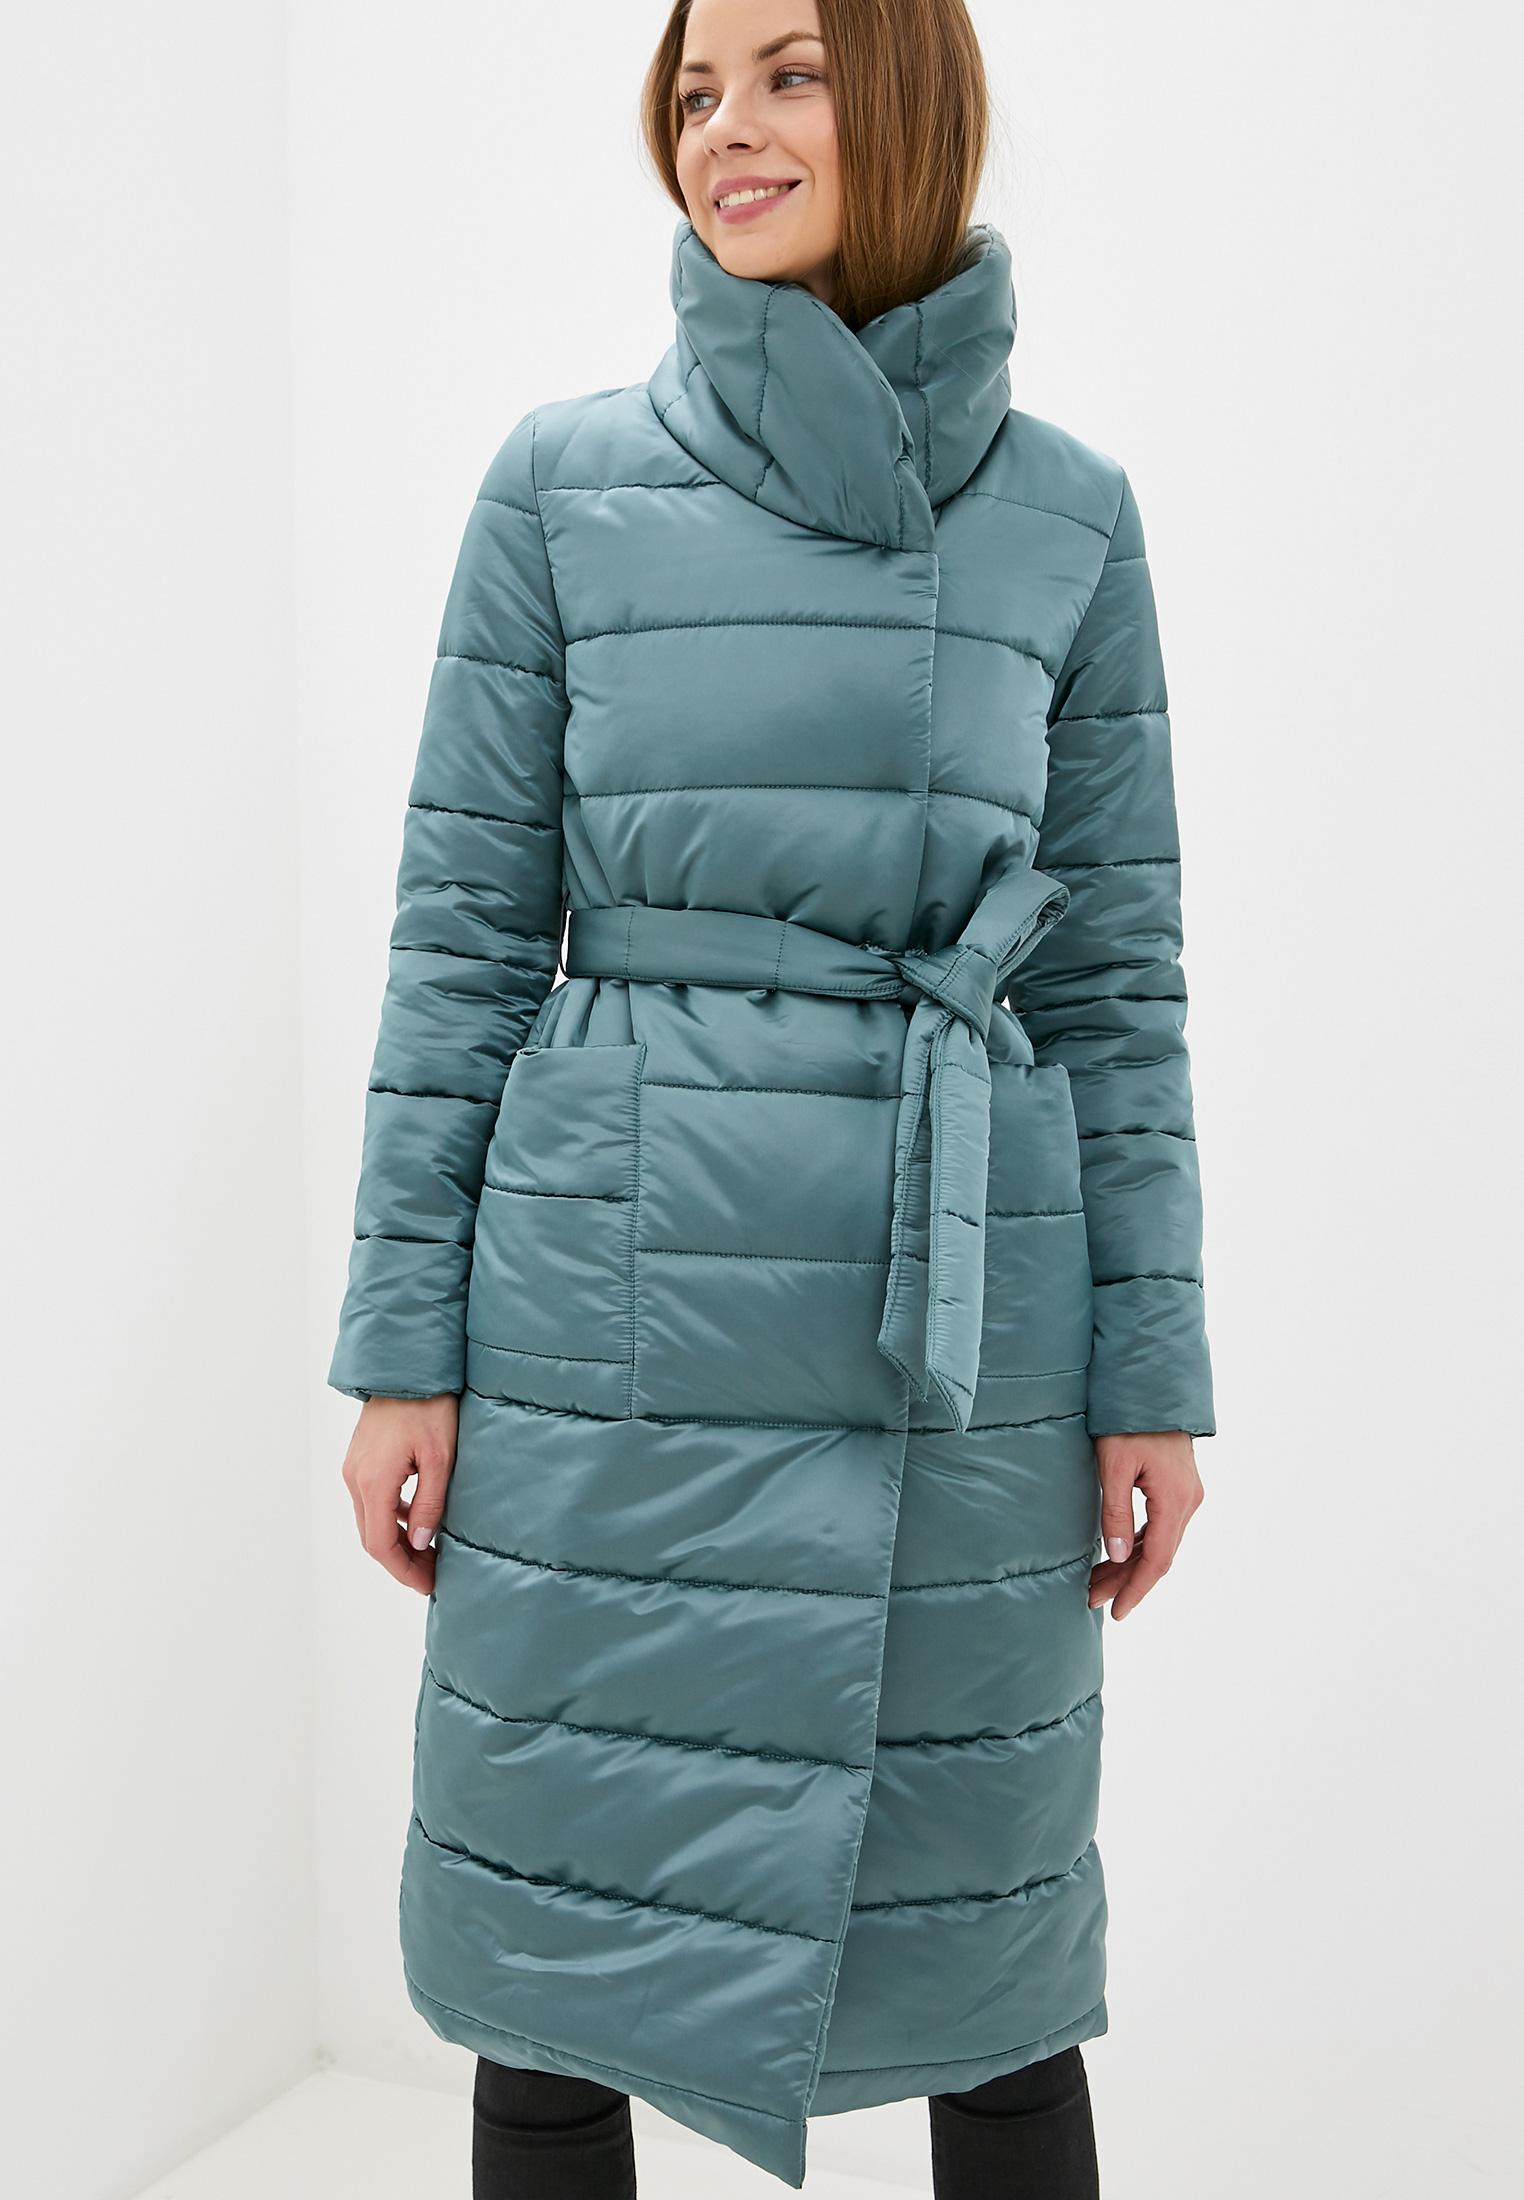 Куртка утепленная, Vivaldi, цвет: зеленый. Артикул: MP002XW0GSWK. Одежда / Верхняя одежда